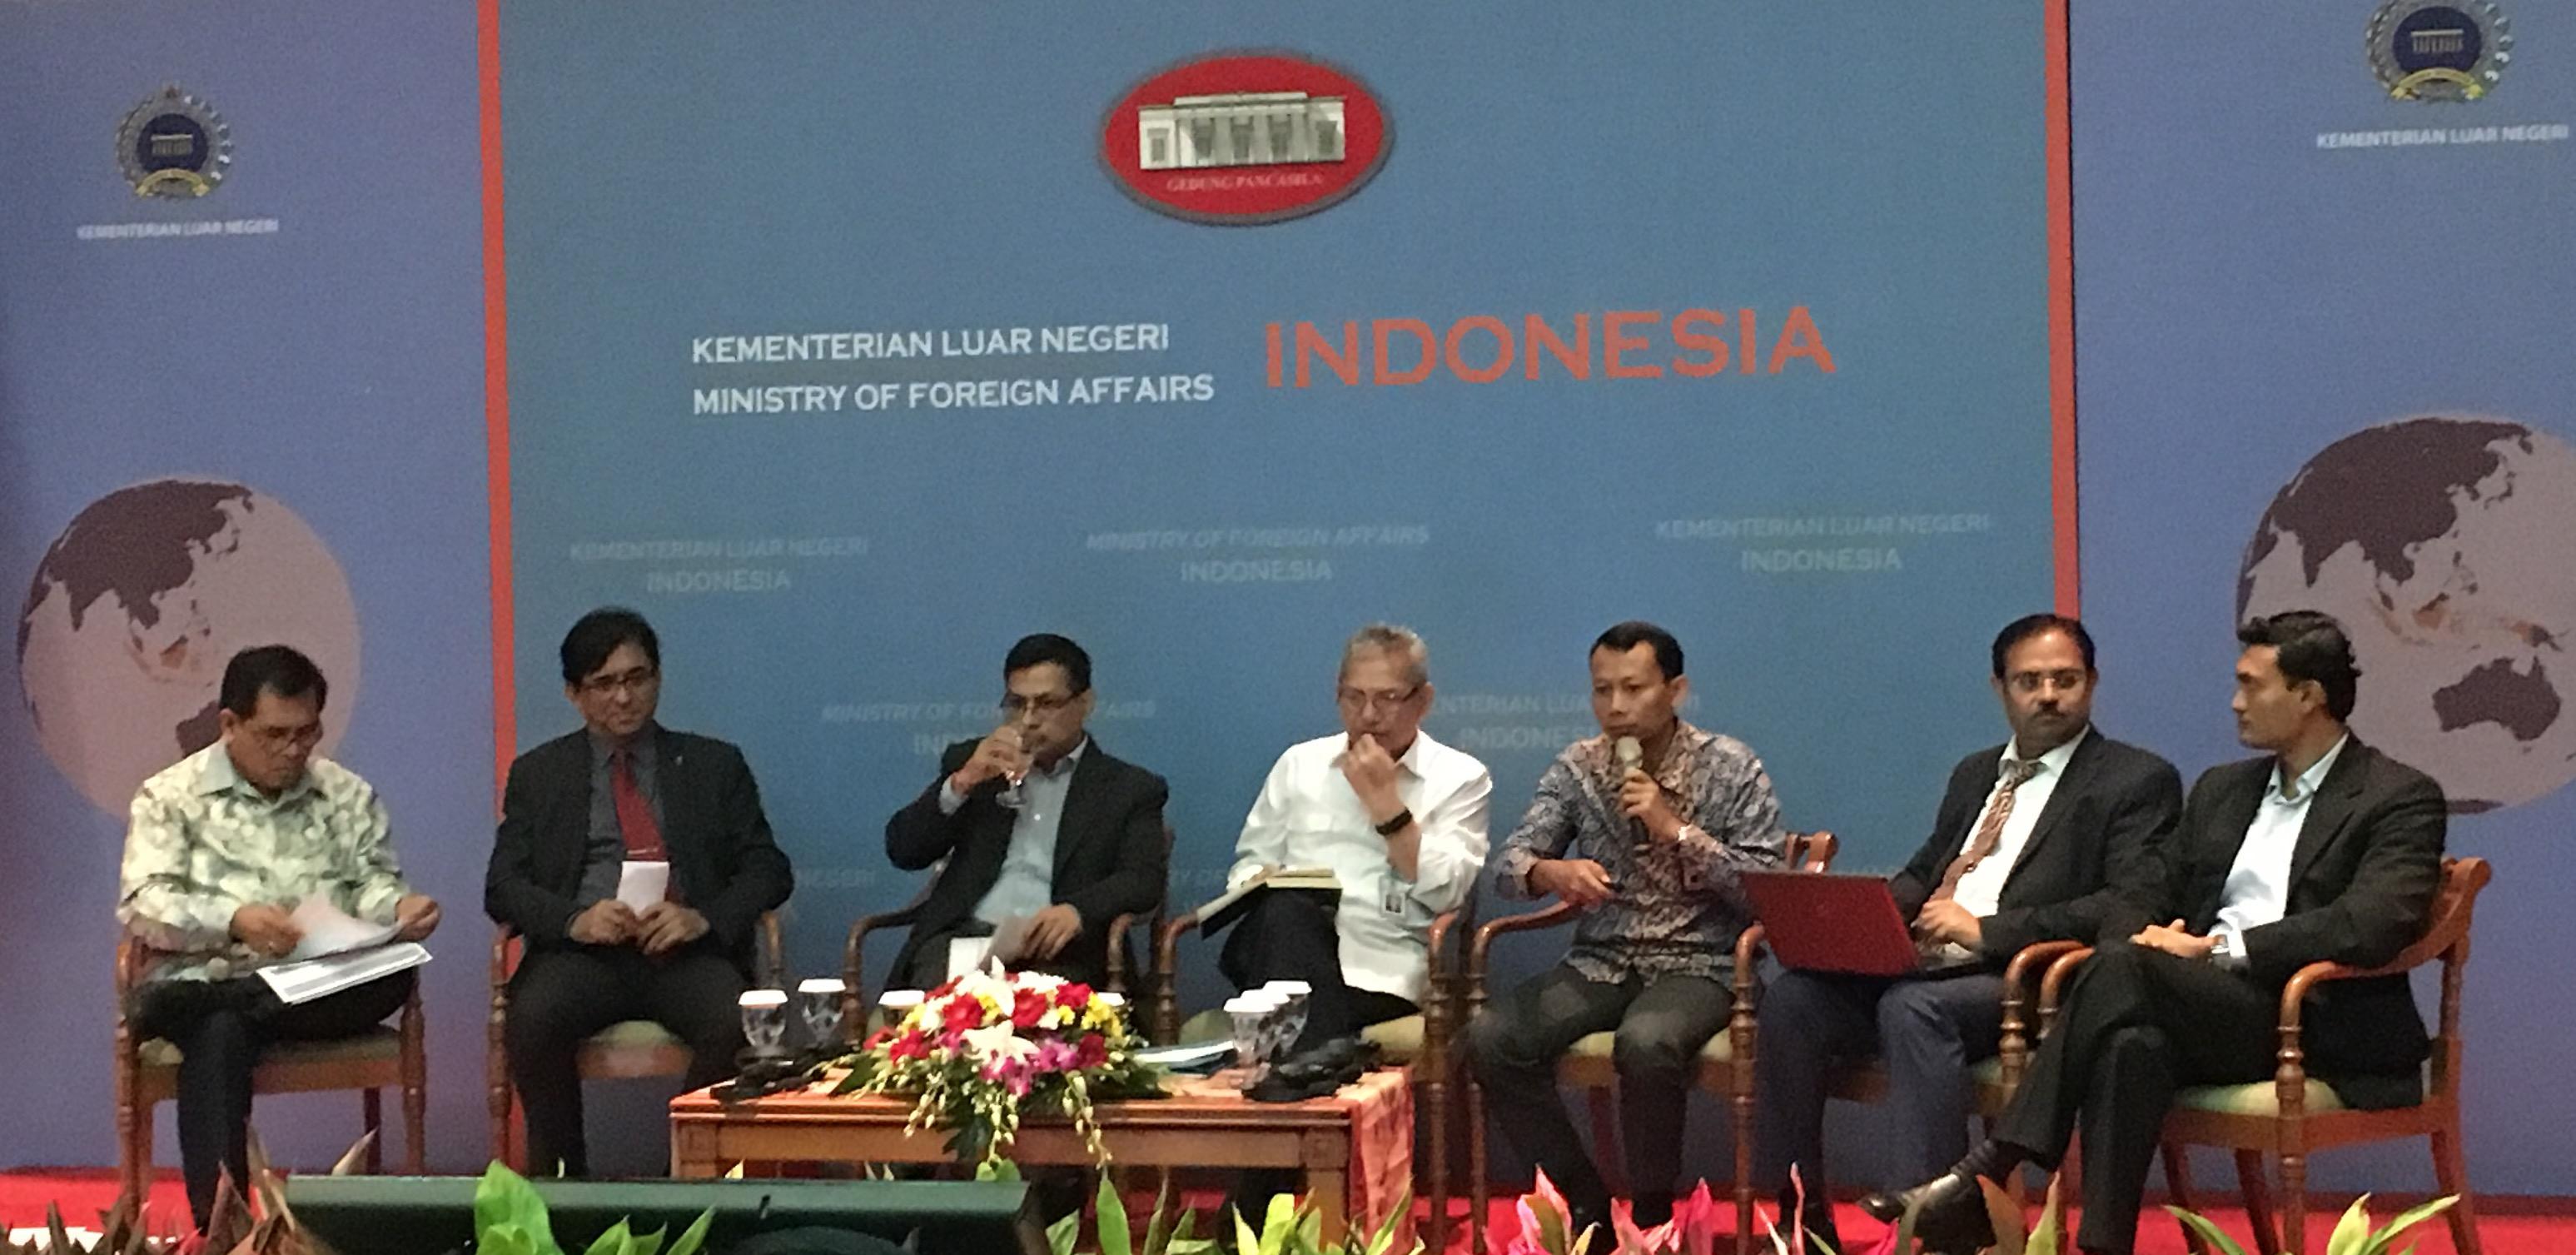 Indonesia-India Jajaki Kerjasama Pengembangan Kota Cerdas